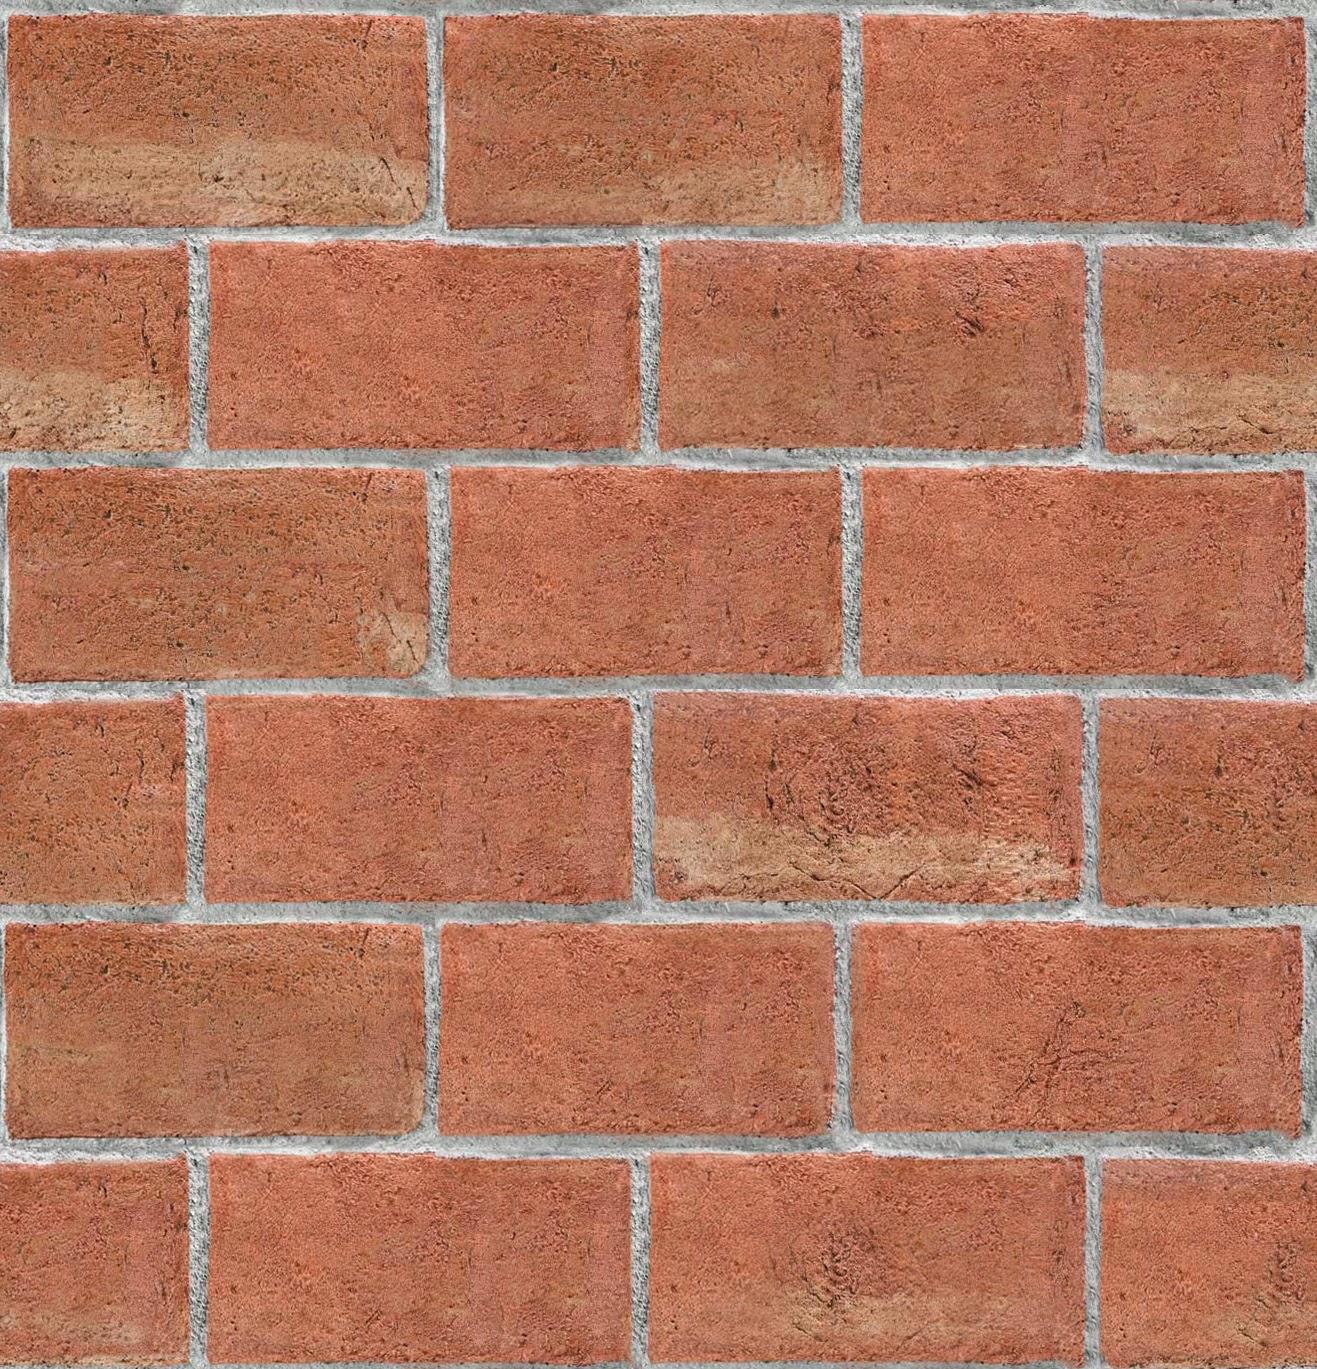 Texture free: Texture brick